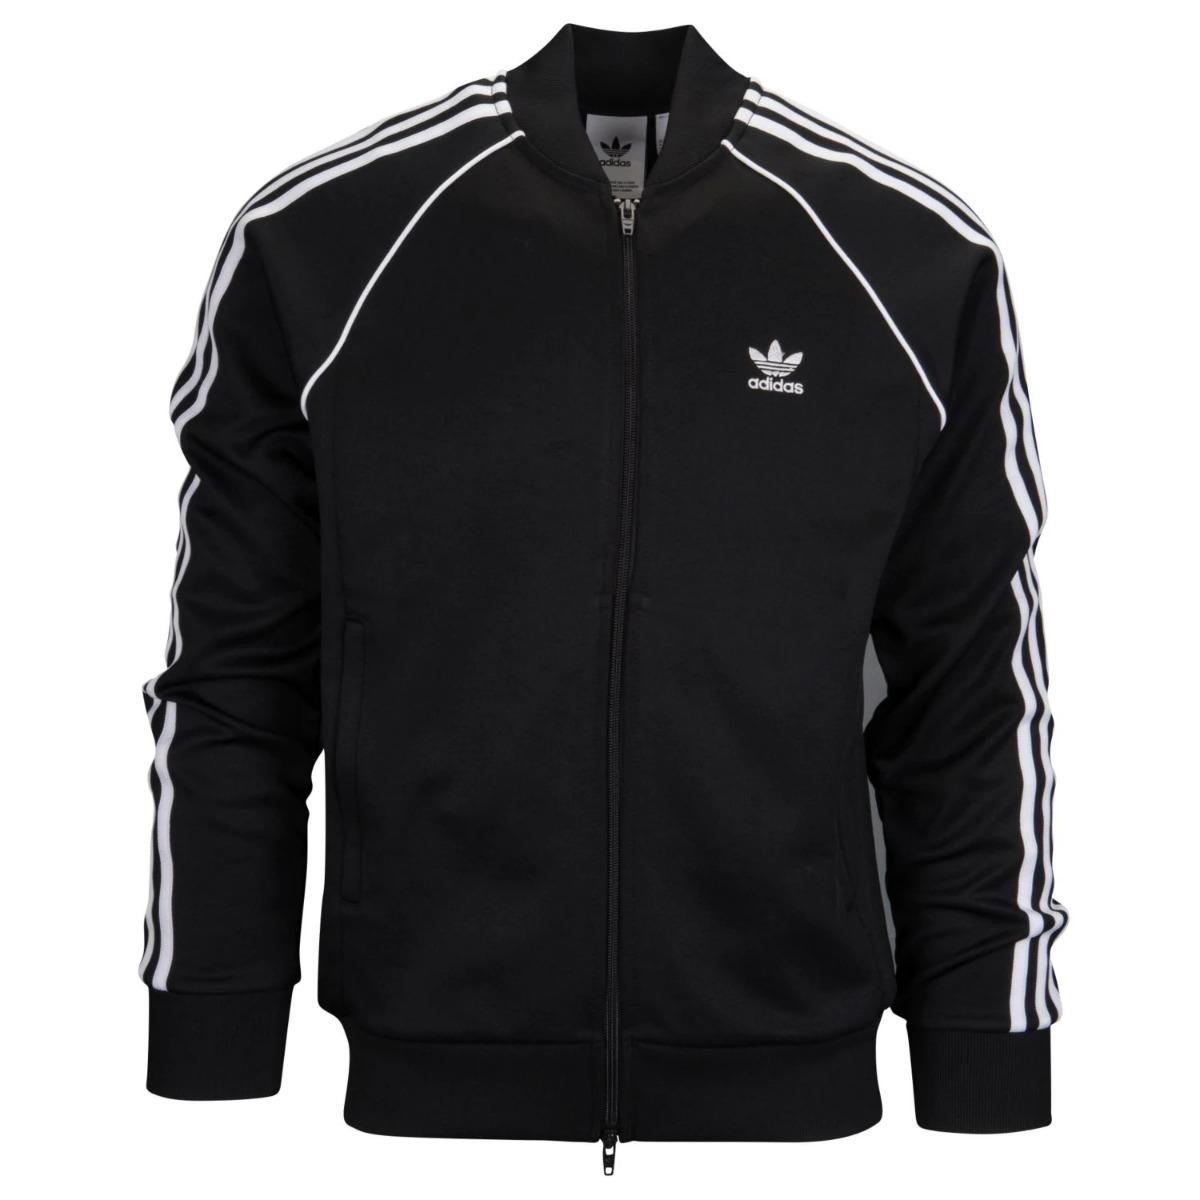 15df8f27c8a01 chaqueta adidas originals sst tt black. Cargando zoom.